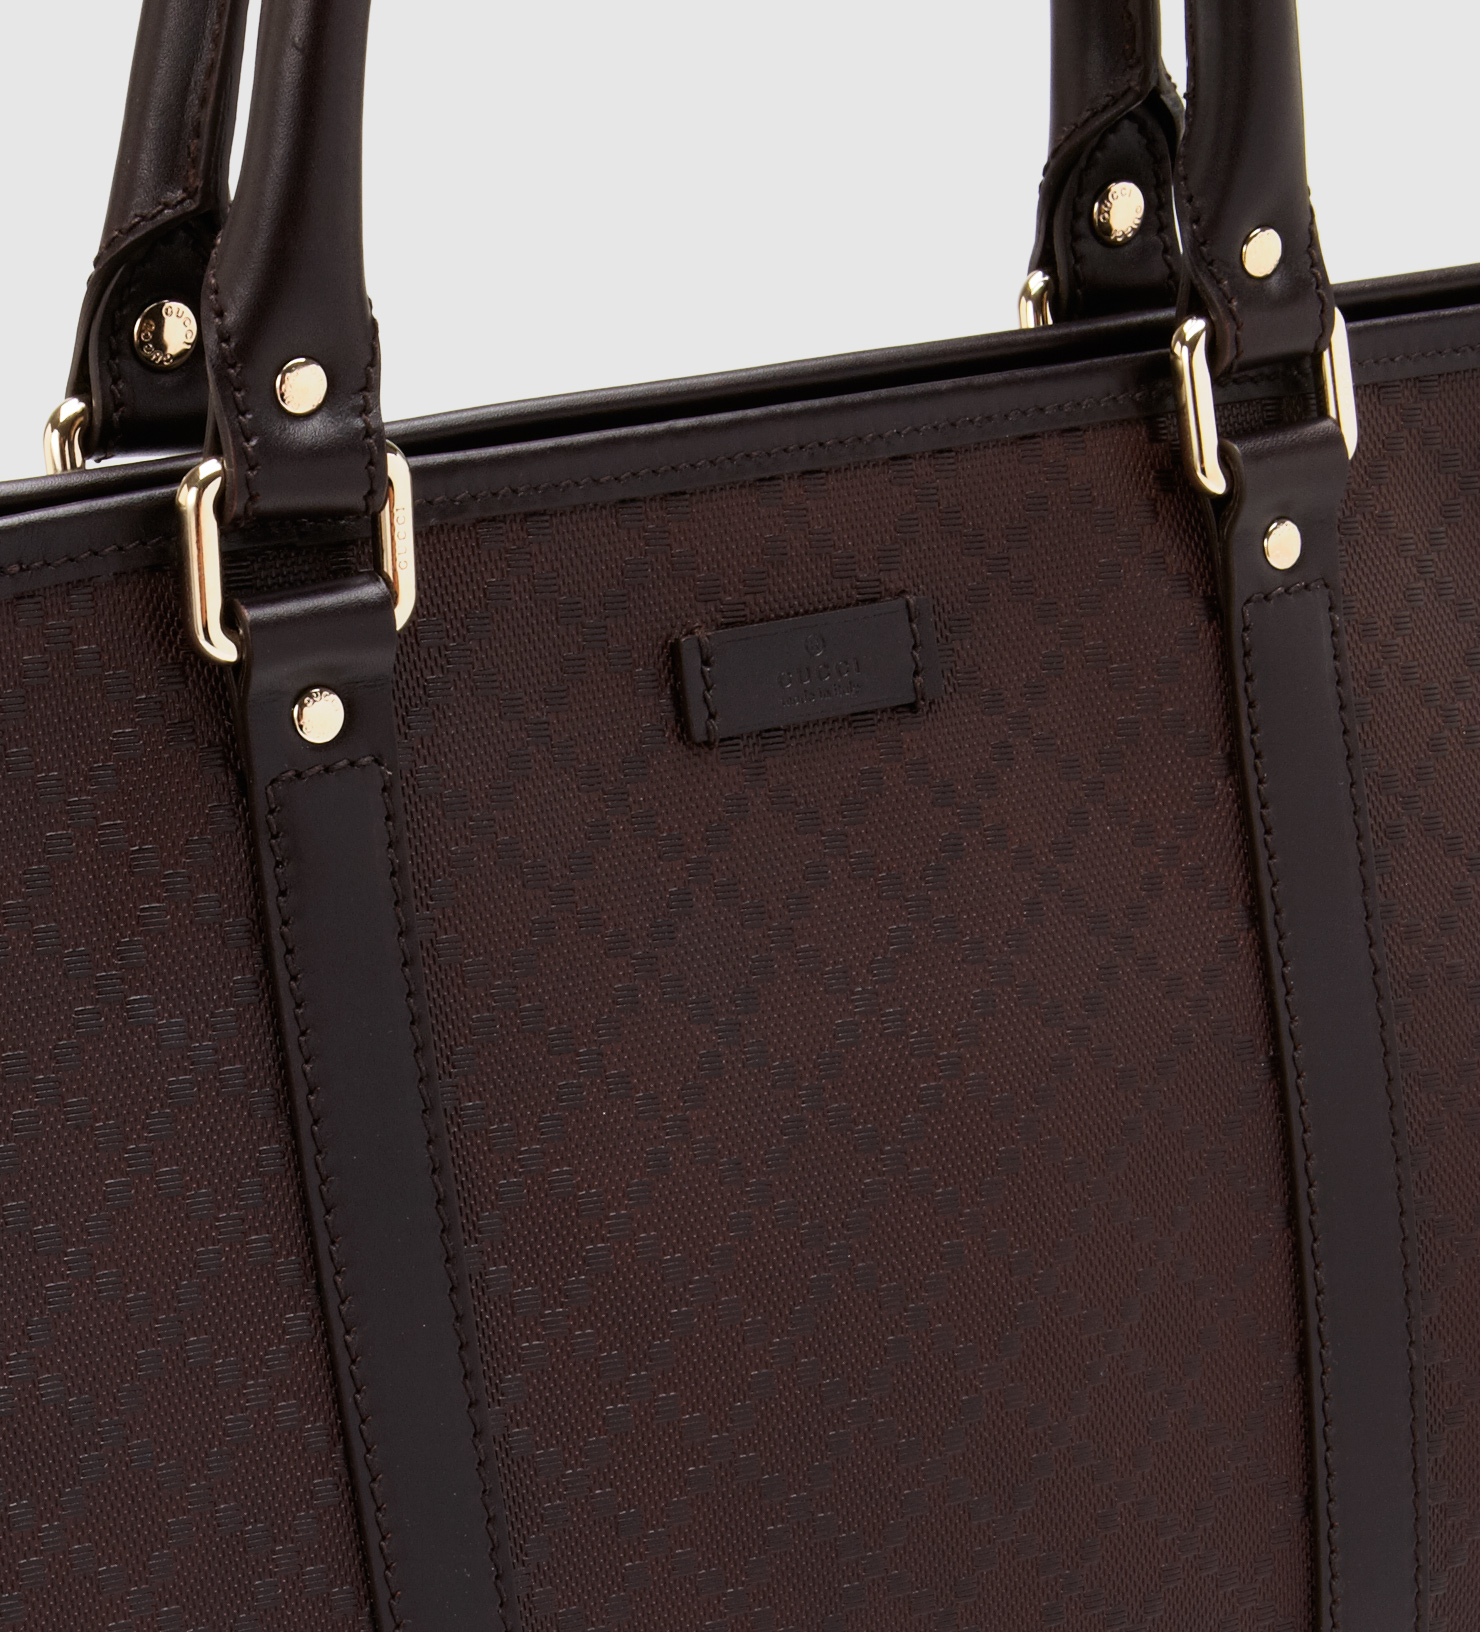 f371e16a9198 Gucci Medium Brown Diamante Leather Top Handle Tote in Brown - Lyst